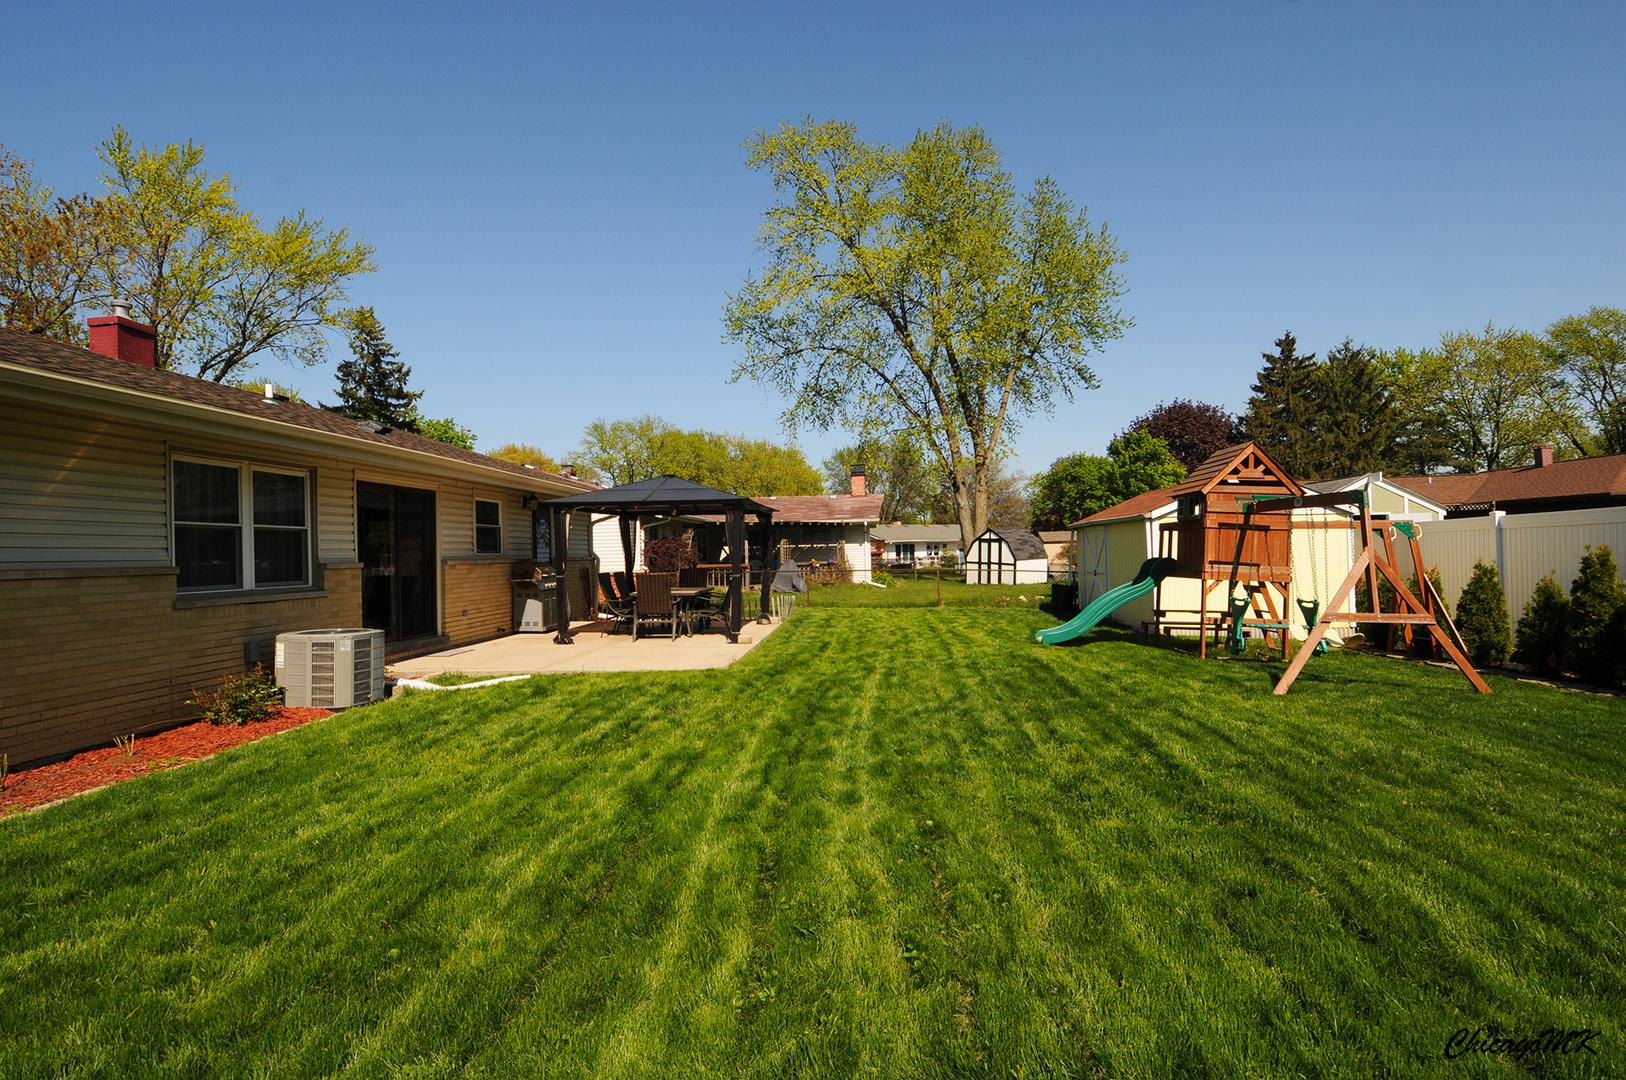 109 Crest, ELK GROVE VILLAGE, Illinois, 60007